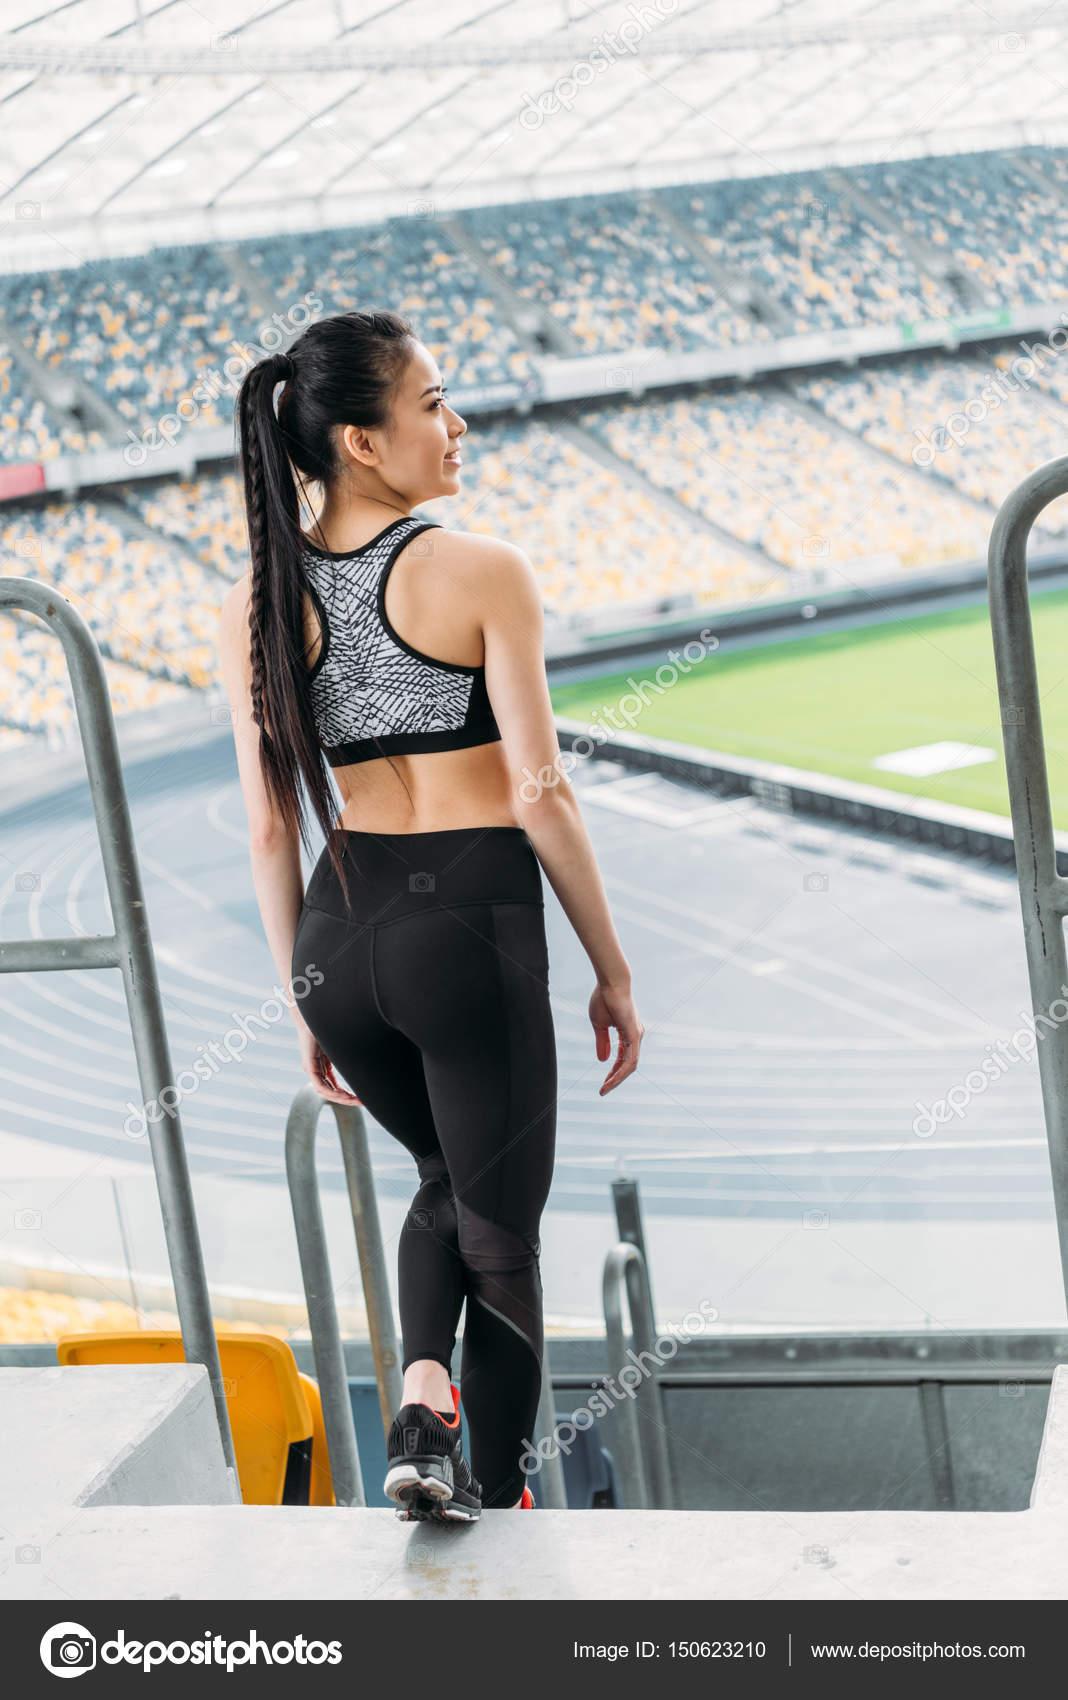 Sport Asiatique sportive asiatique sportswear — photographie arturverkhovetskiy